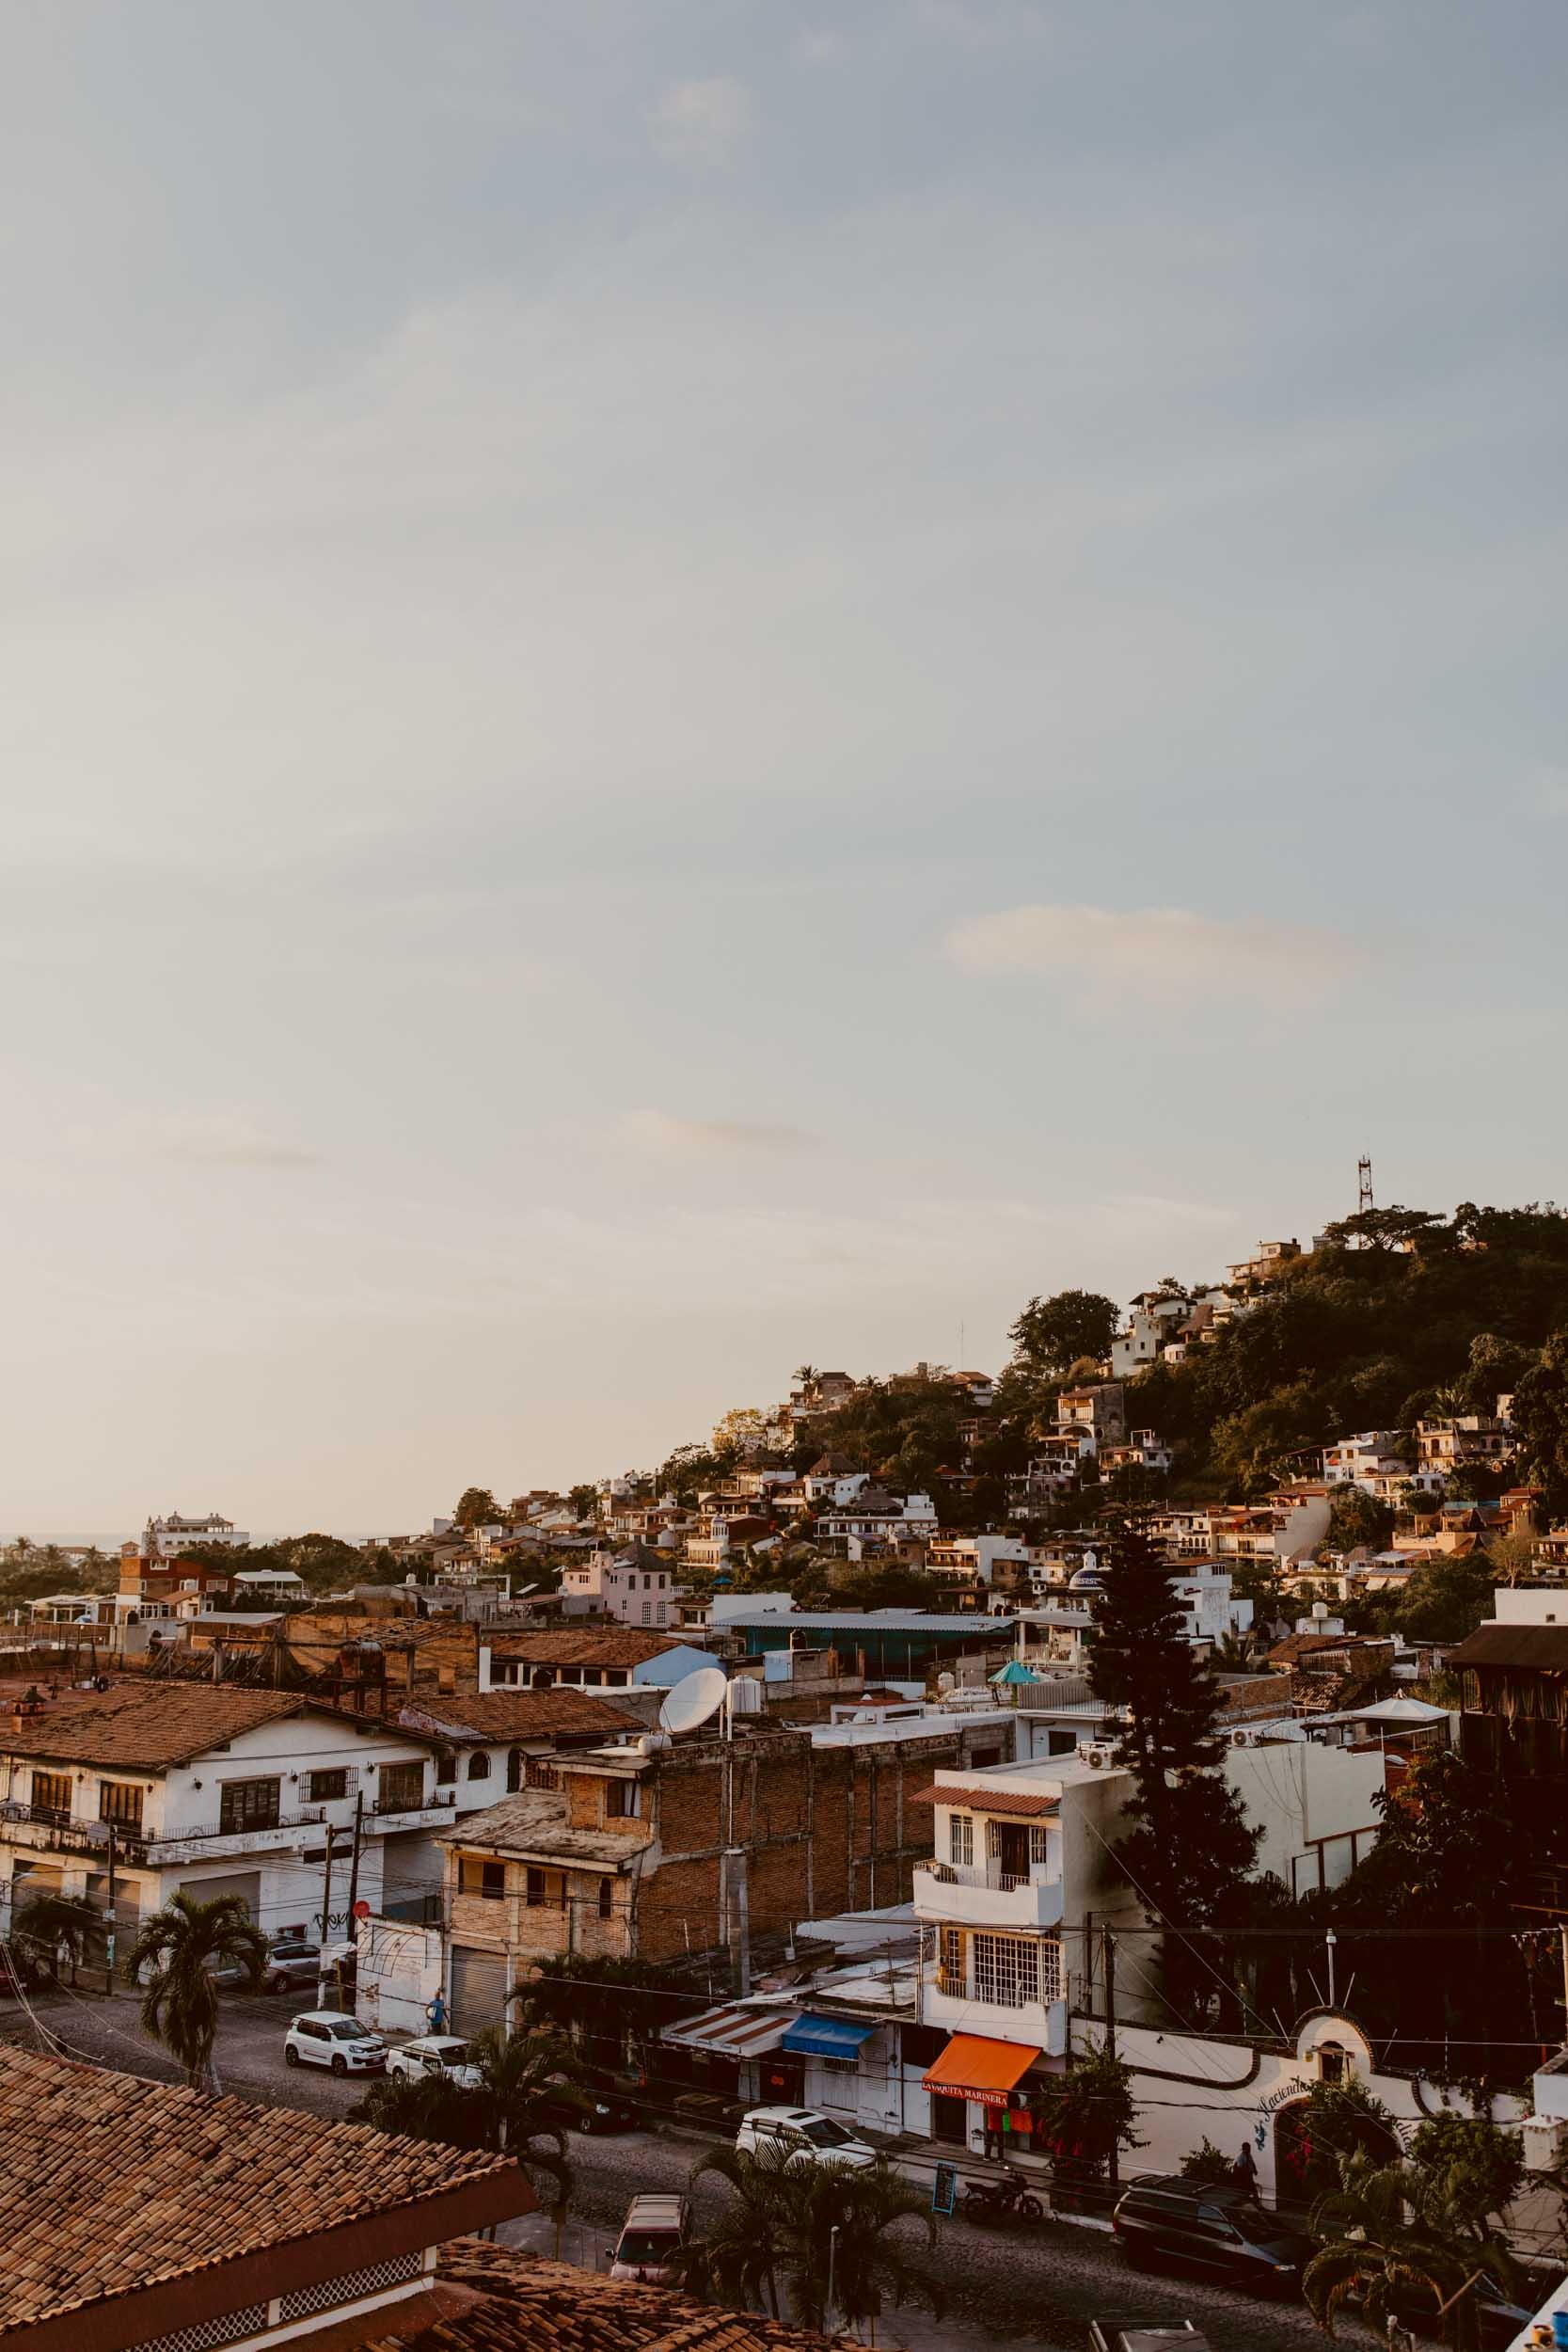 Miriam-Subbiah-puerto-vallarta-60.jpg